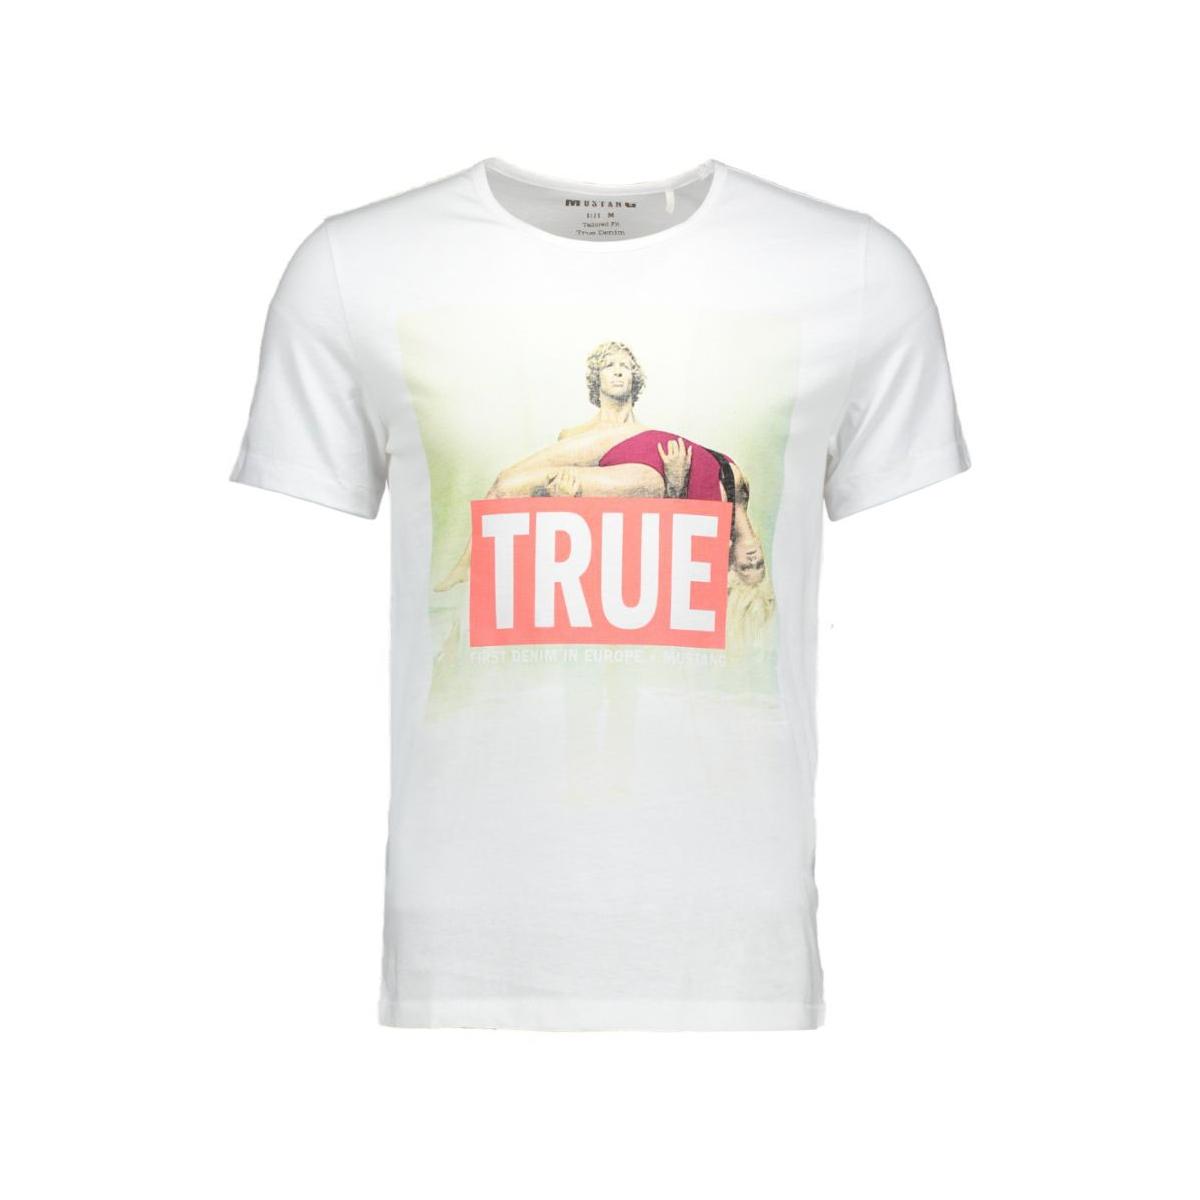 6326 1351 200 mustang t-shirt 200